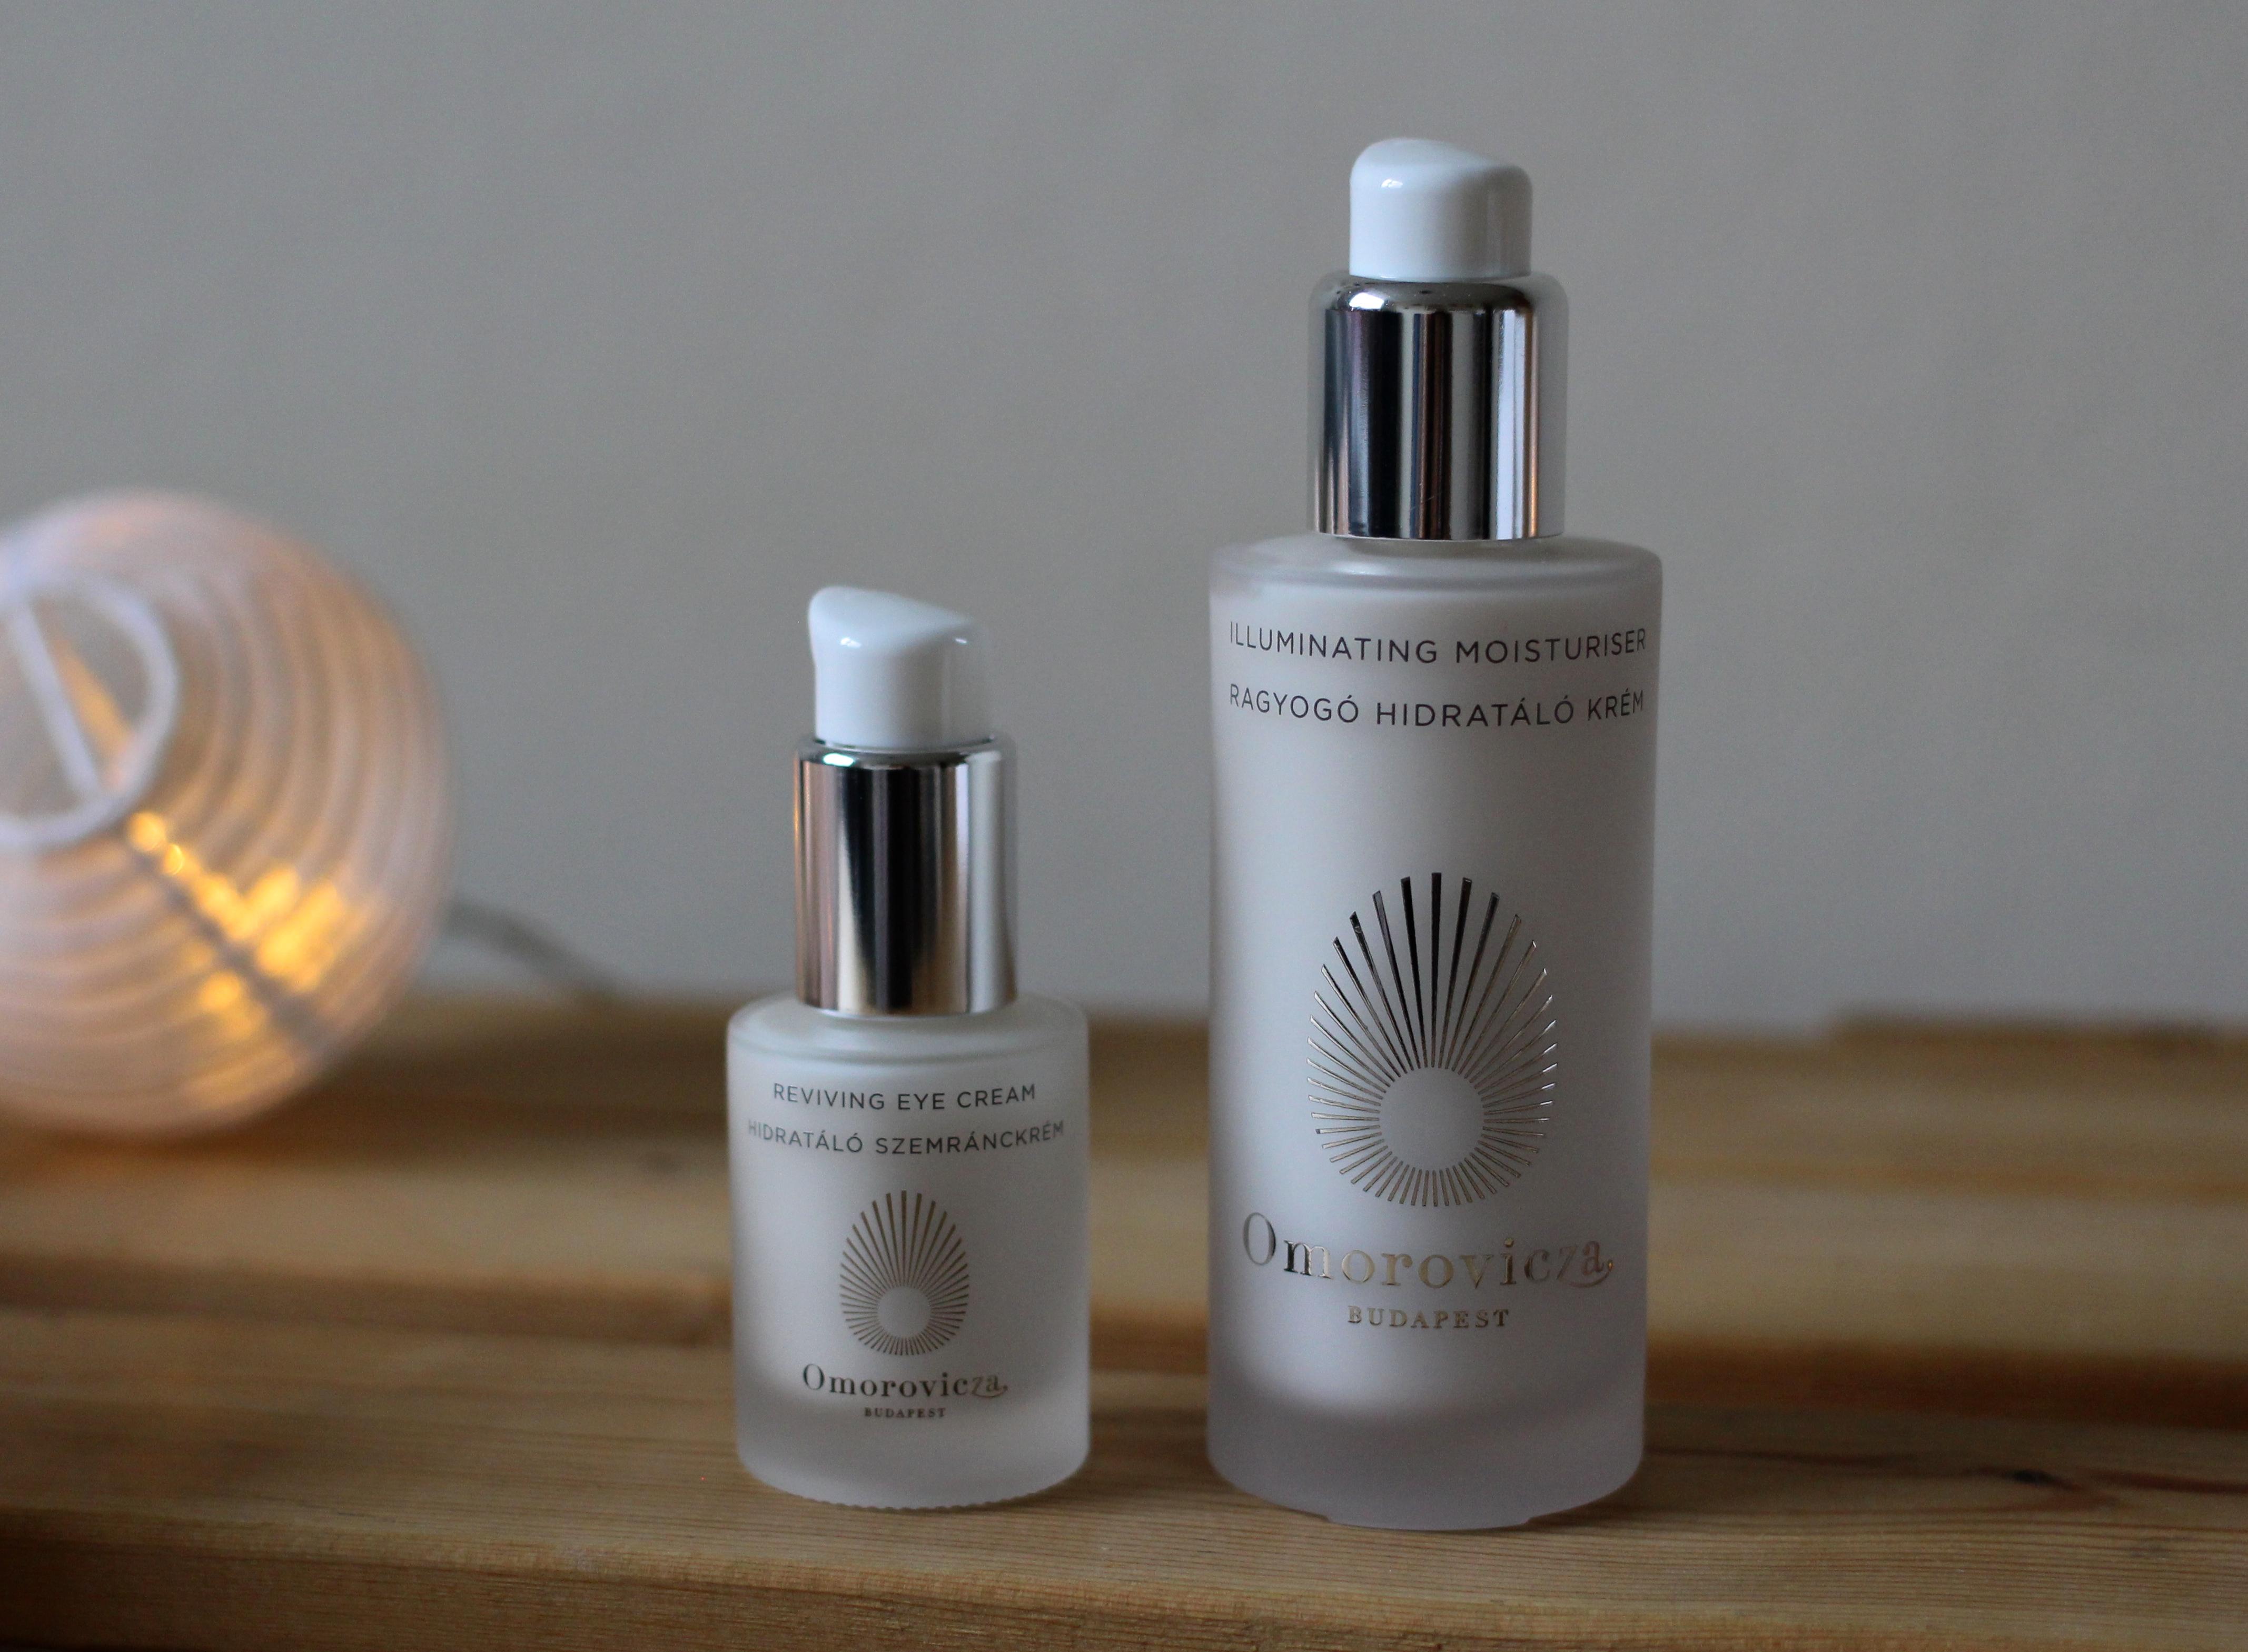 Omorovicza Moisturiser and Eye Cream Review